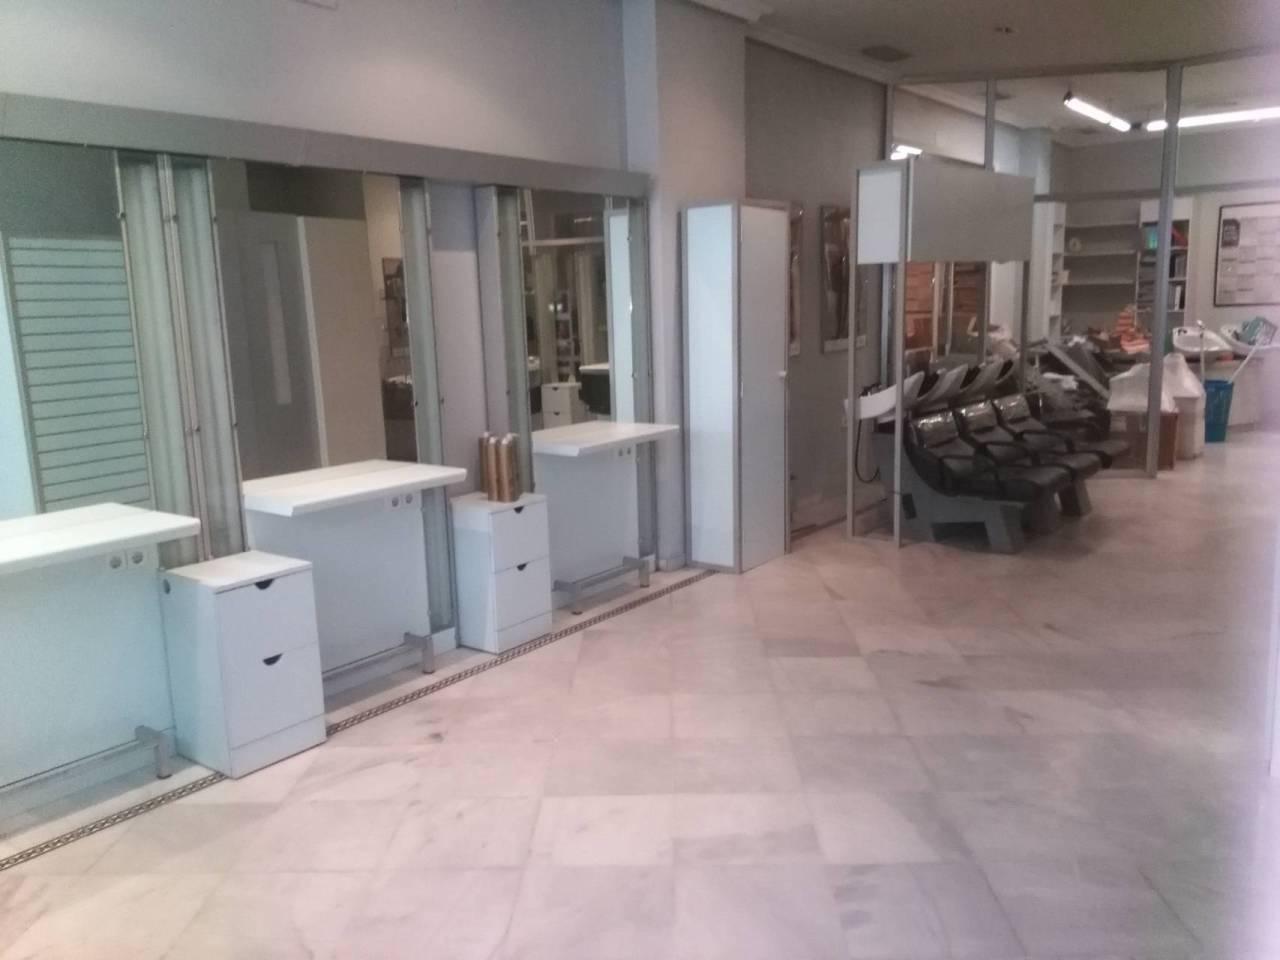 Local en alquiler con 200 m2,  en Alcalá de Guadaíra, CENTRO